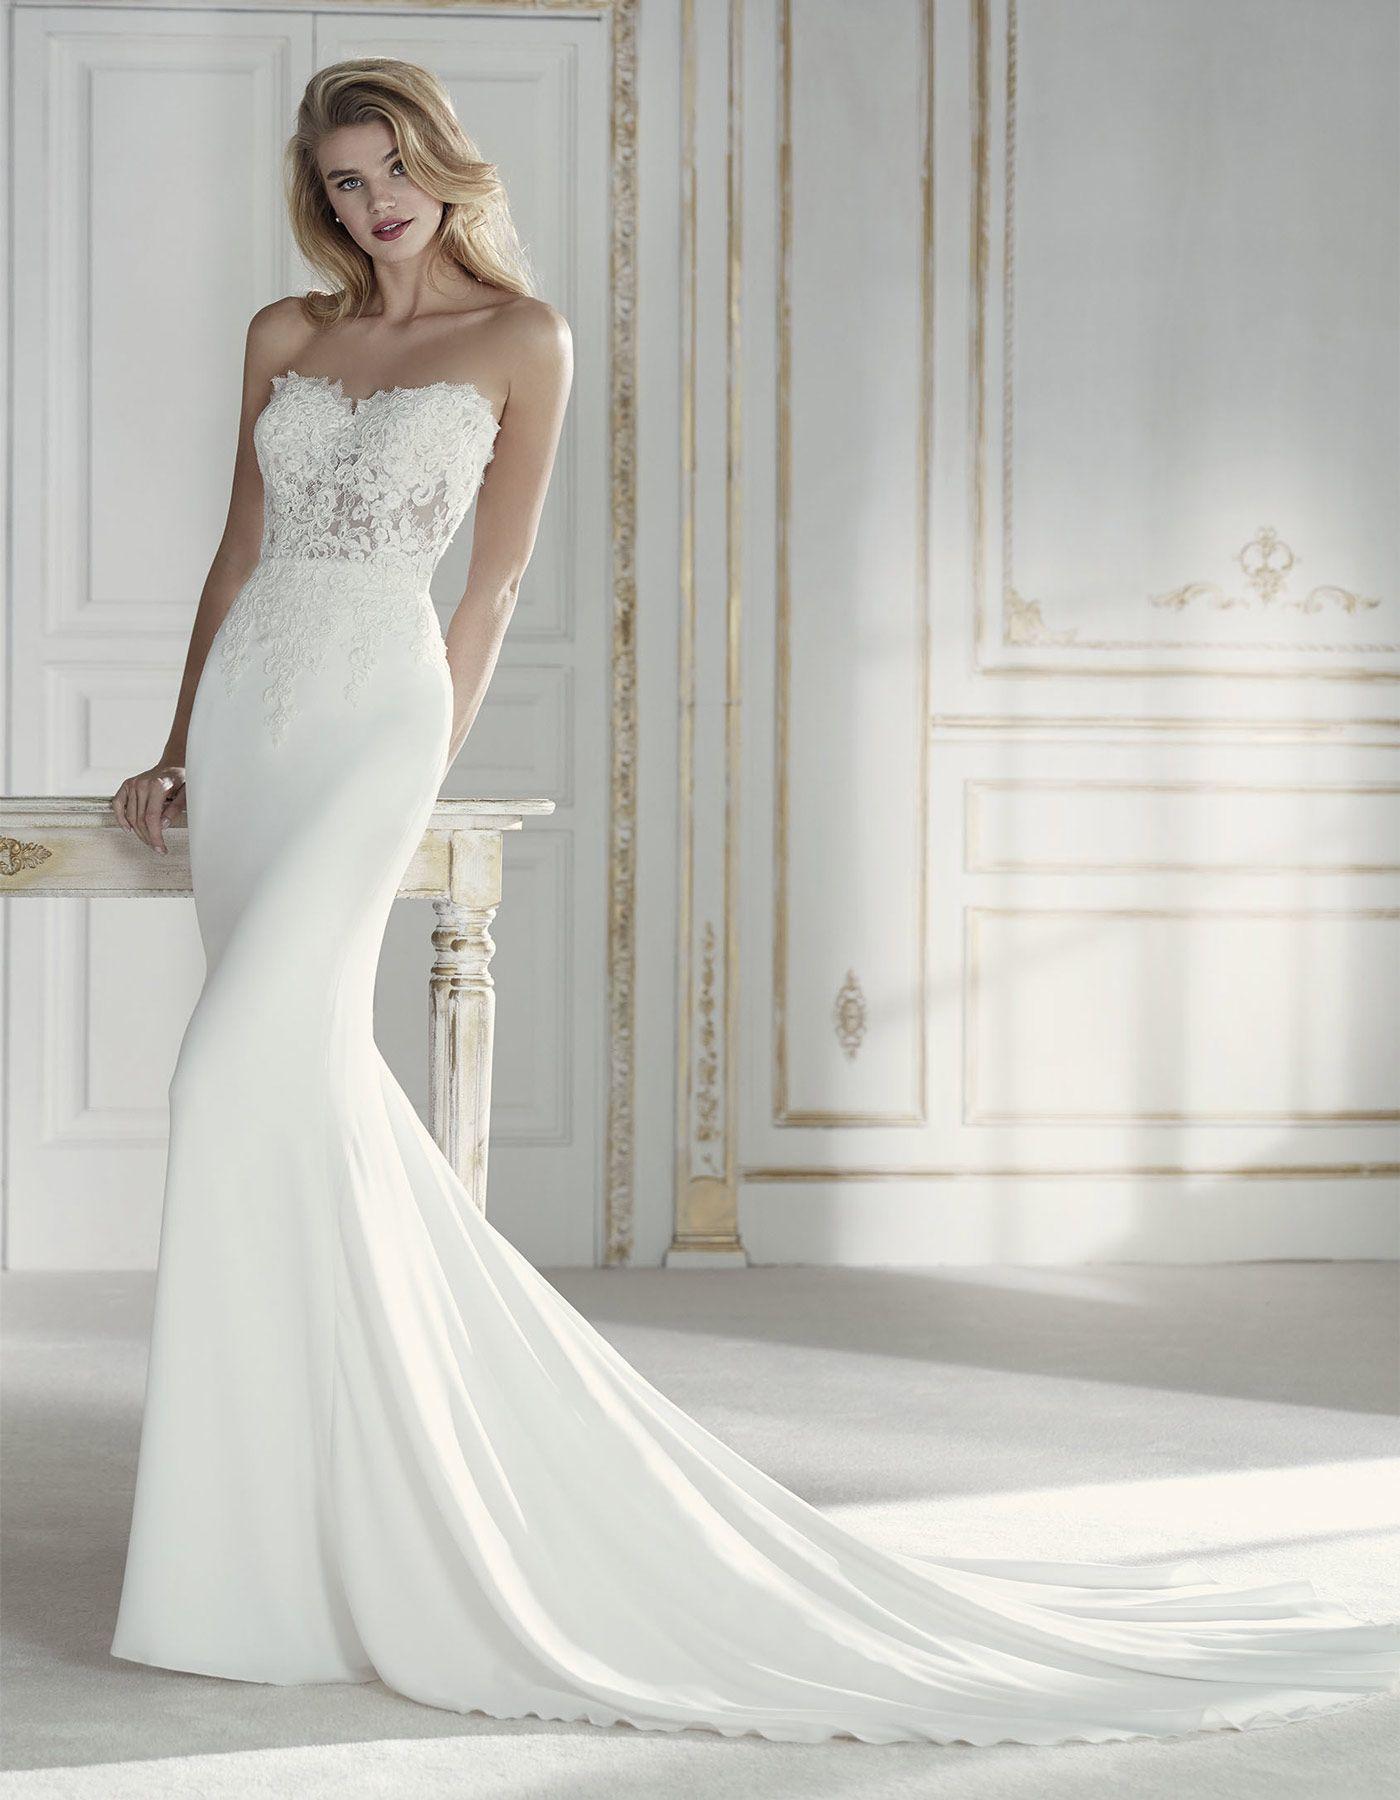 Strapless slim fitted wedding dress paciana by la sposa wedding